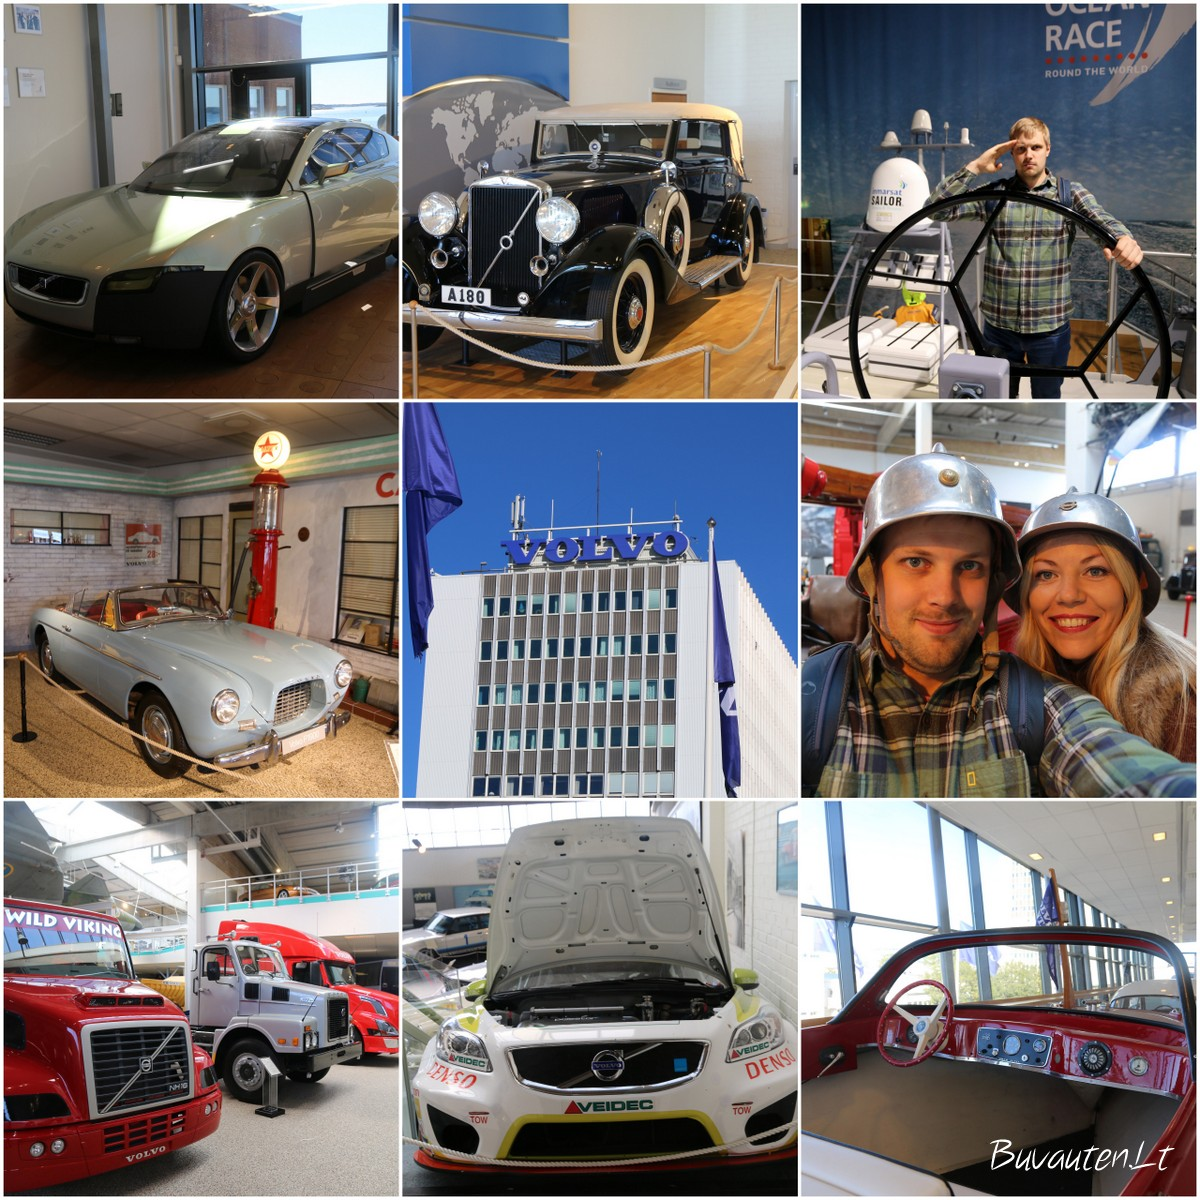 Volvo muziejus Geteborge